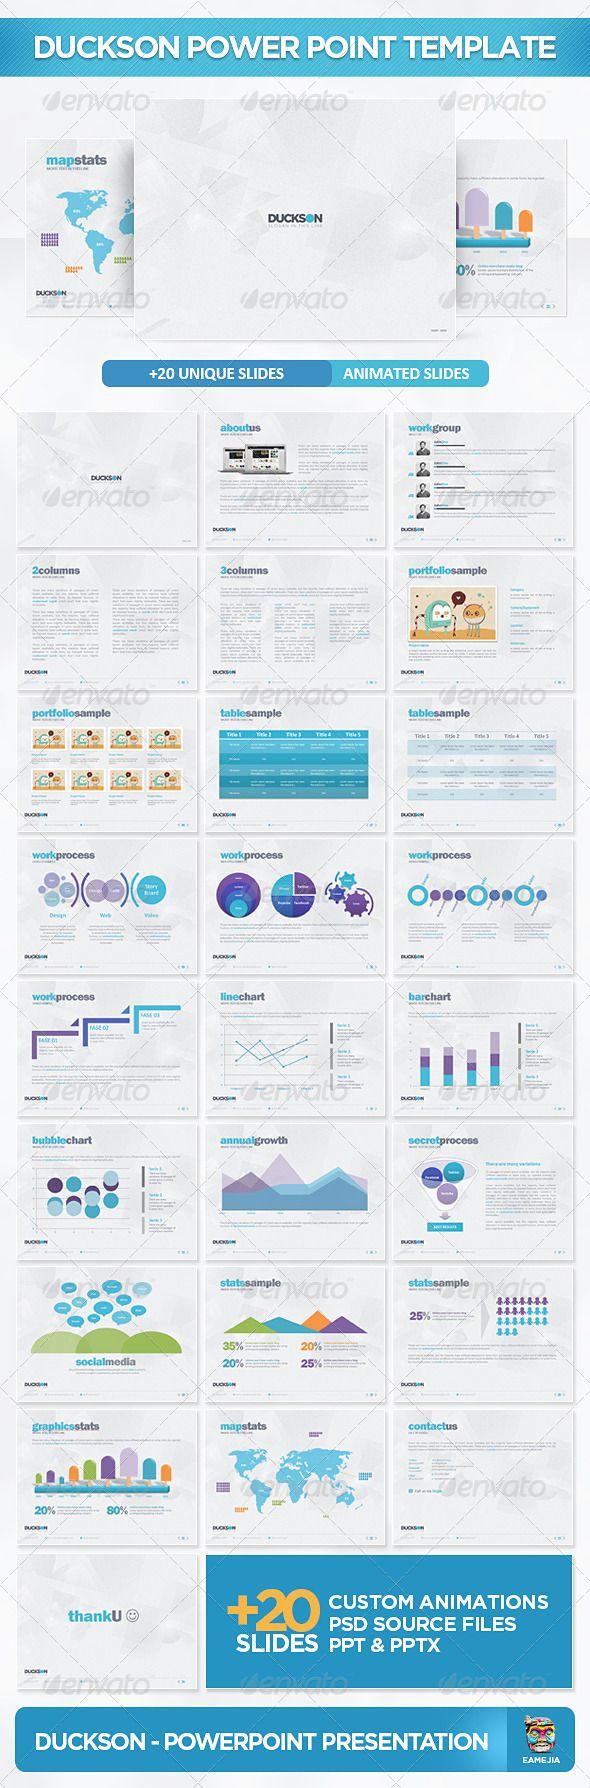 Presentation Templates - Duckson PowerPoint Presentation Template | GraphicRiver